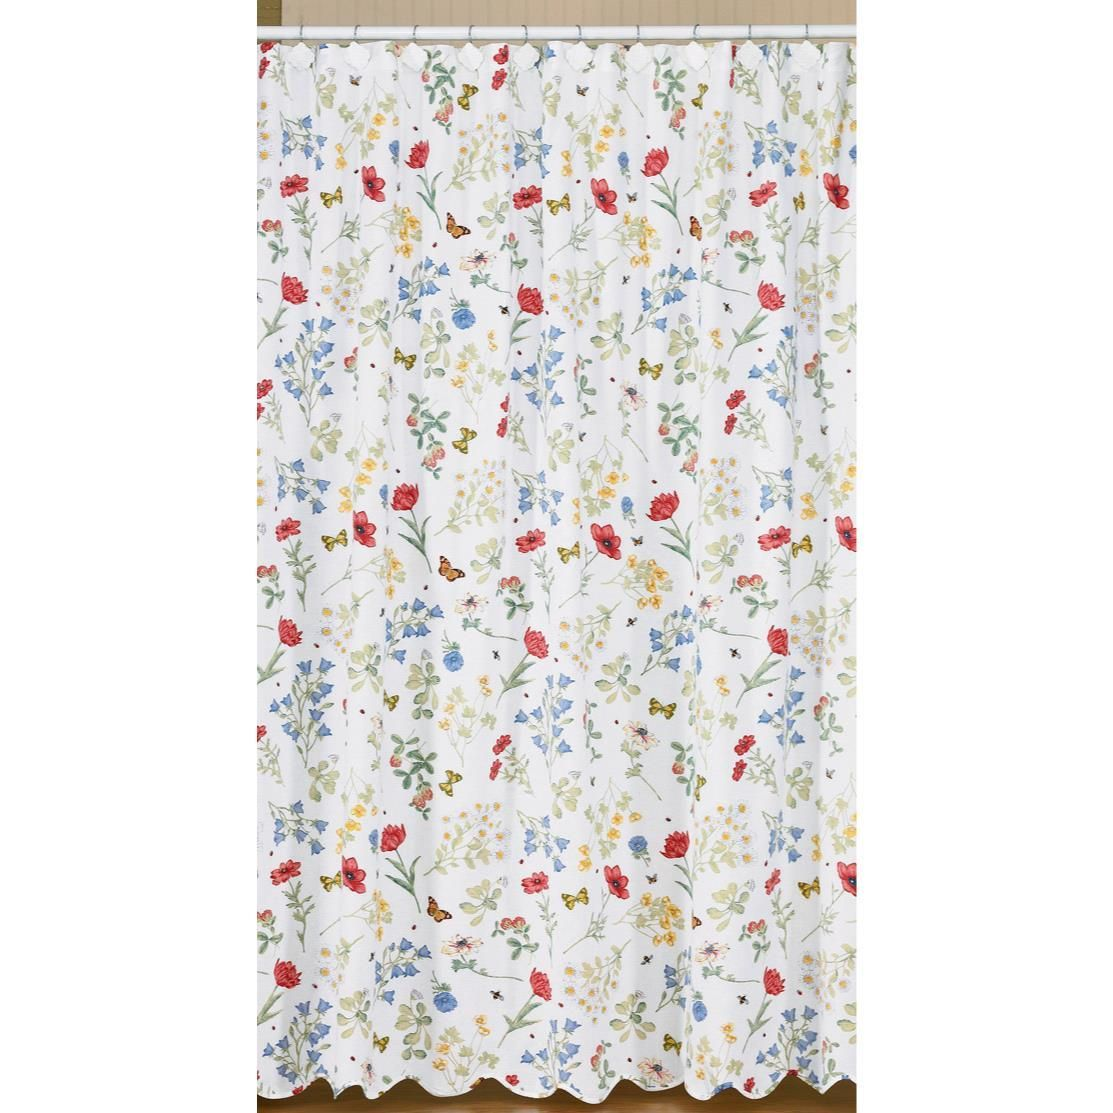 Country Village Shoppe Wildflower Shower Curtain 72x72 68 95